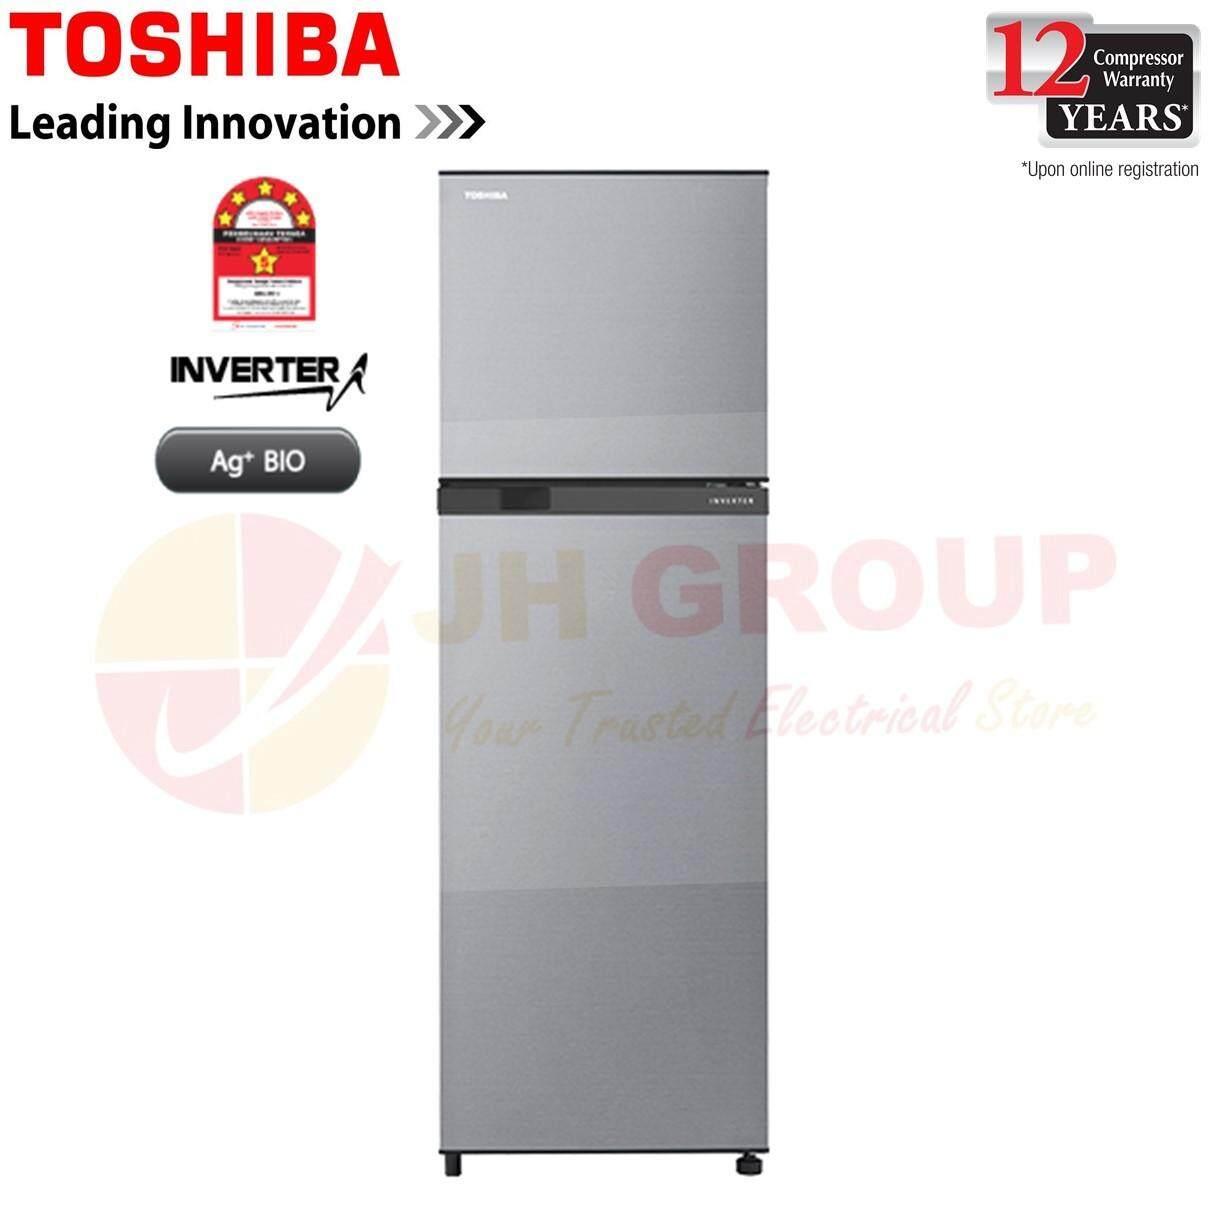 (2019 NEW) TOSHIBA GR-B31MU(SS) 273L INVERTER 2 DOOR REFRIGERATOR FRIDGE PETI AIS PETI SEJUK